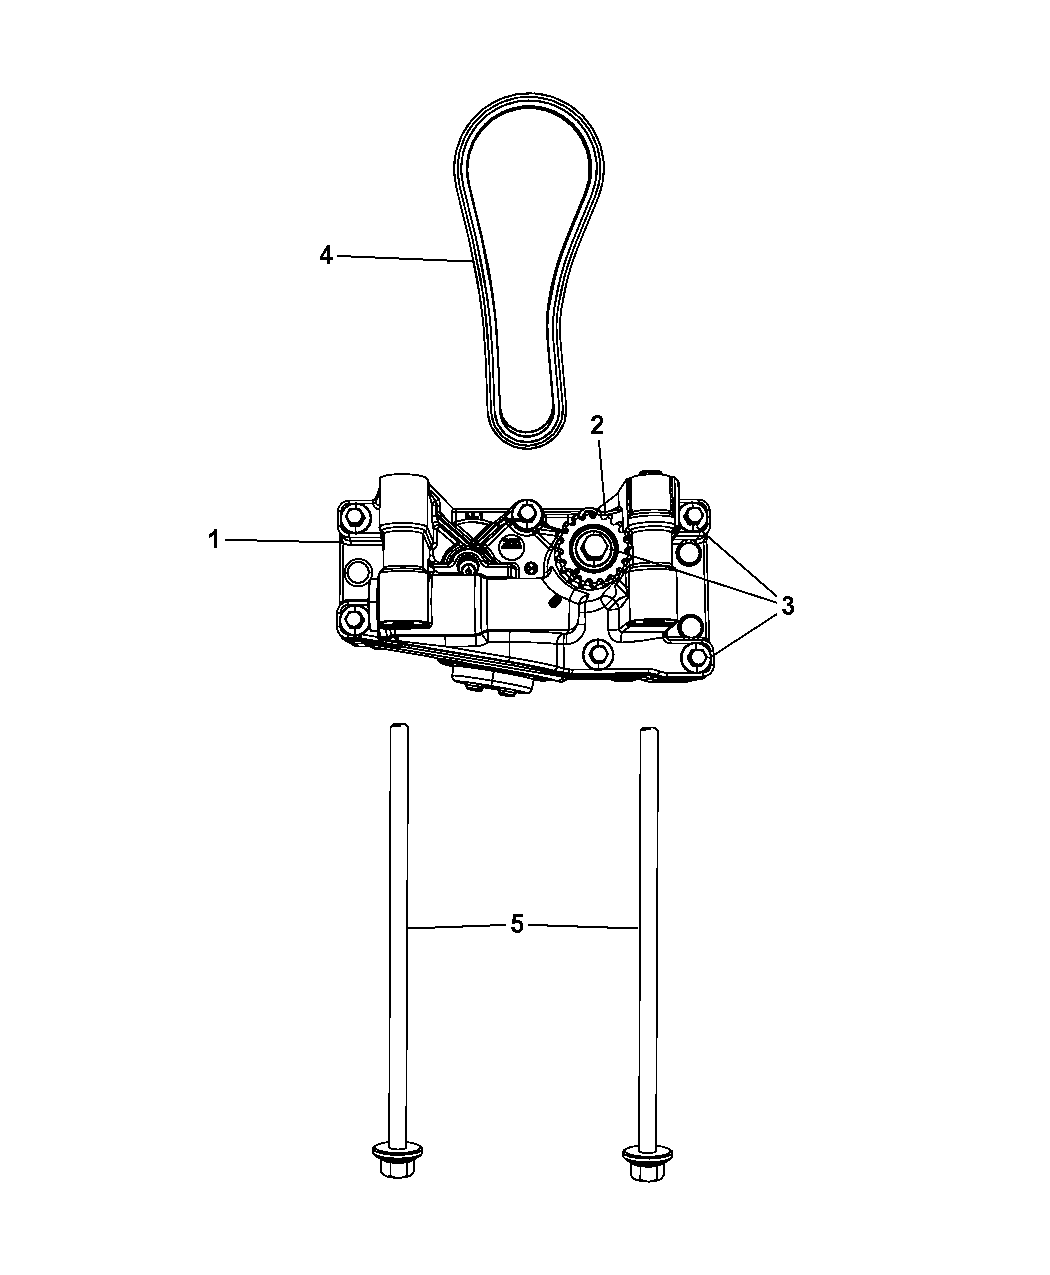 2010 Chrysler Sebring Balance Shaft Oil Pump Assembly Engine Diagram Thumbnail 2